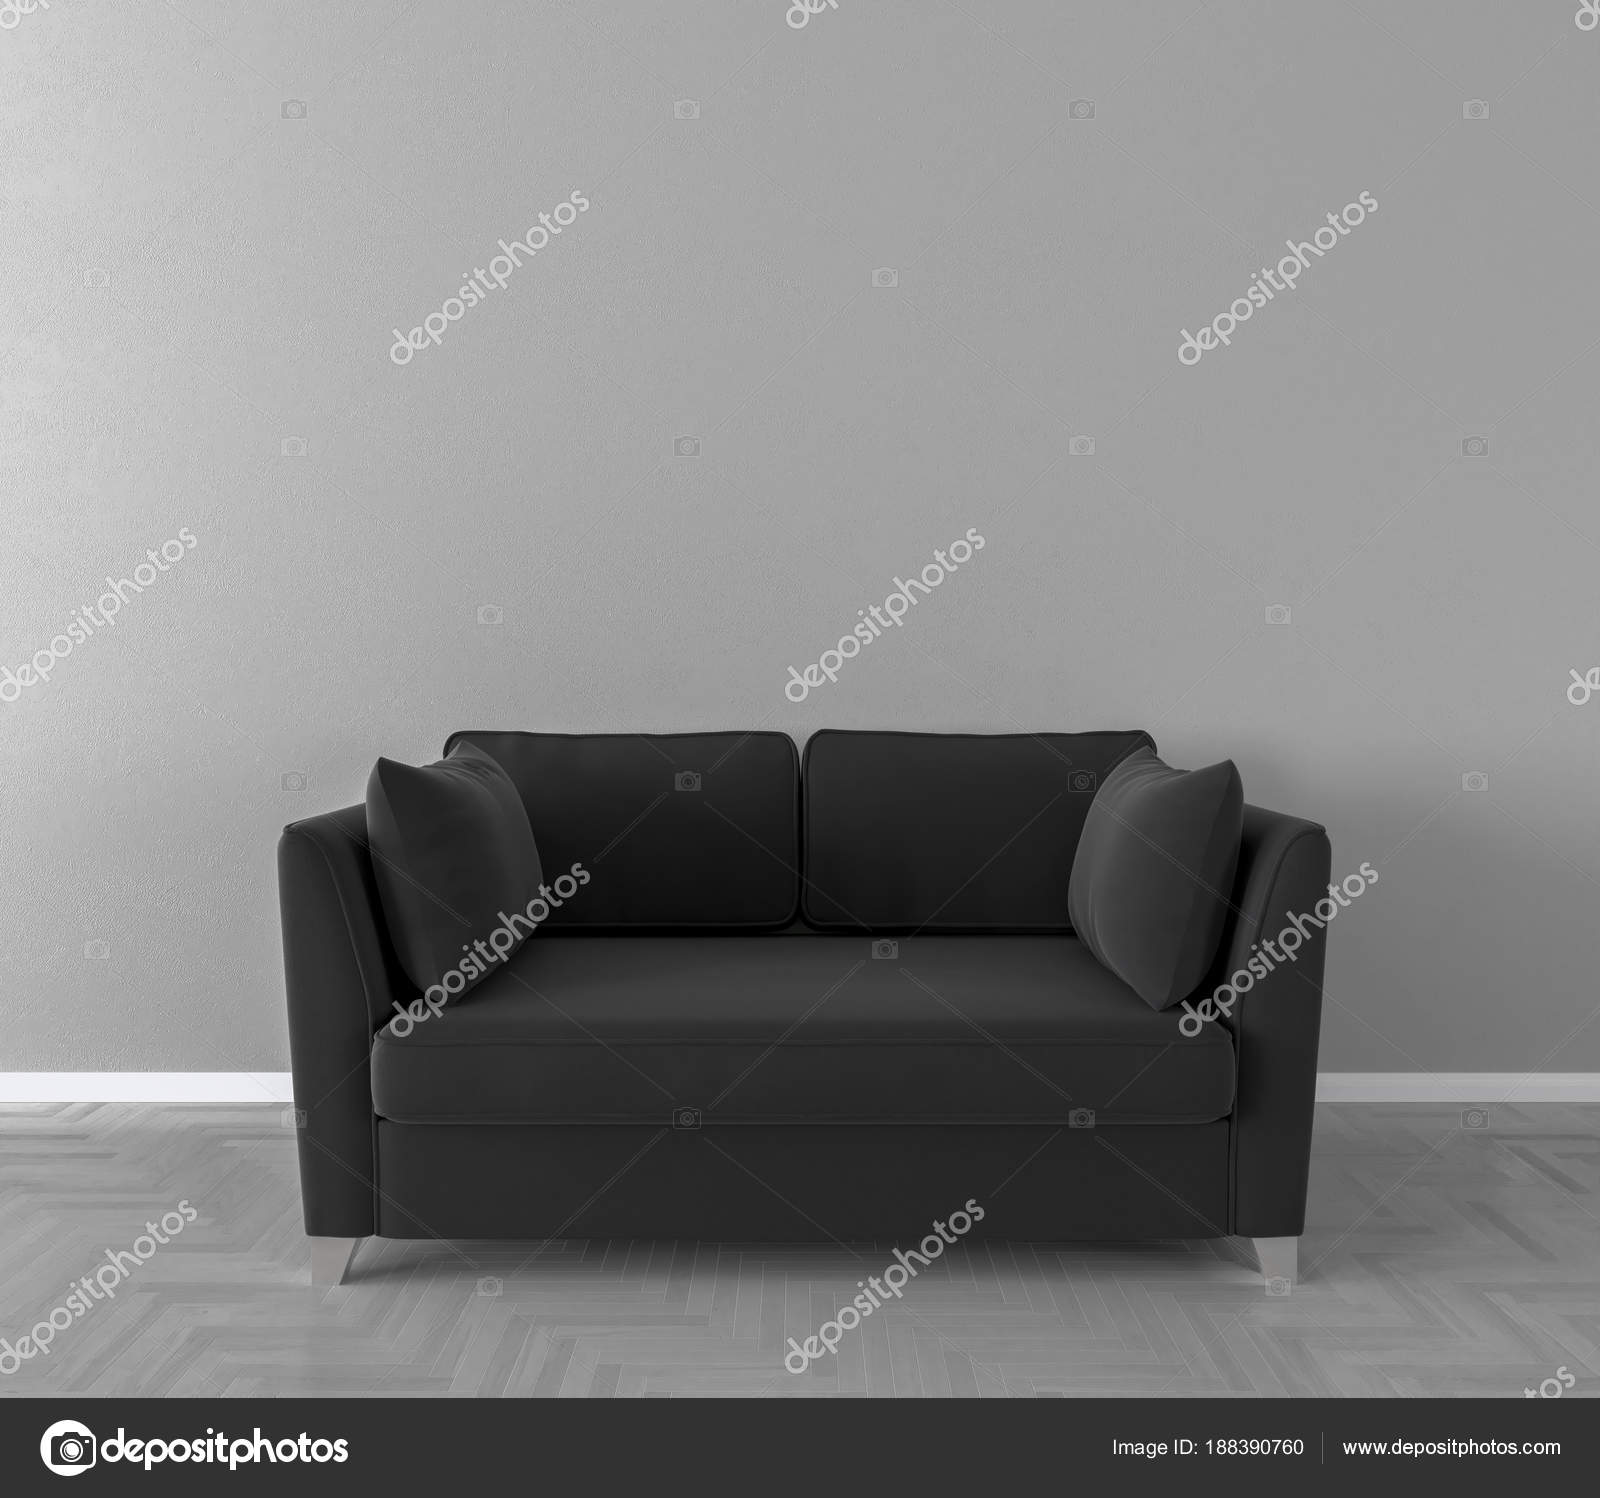 Groovy Solo Sofa Interior 3D Illustration Stock Photo C Pozitivo Ibusinesslaw Wood Chair Design Ideas Ibusinesslaworg